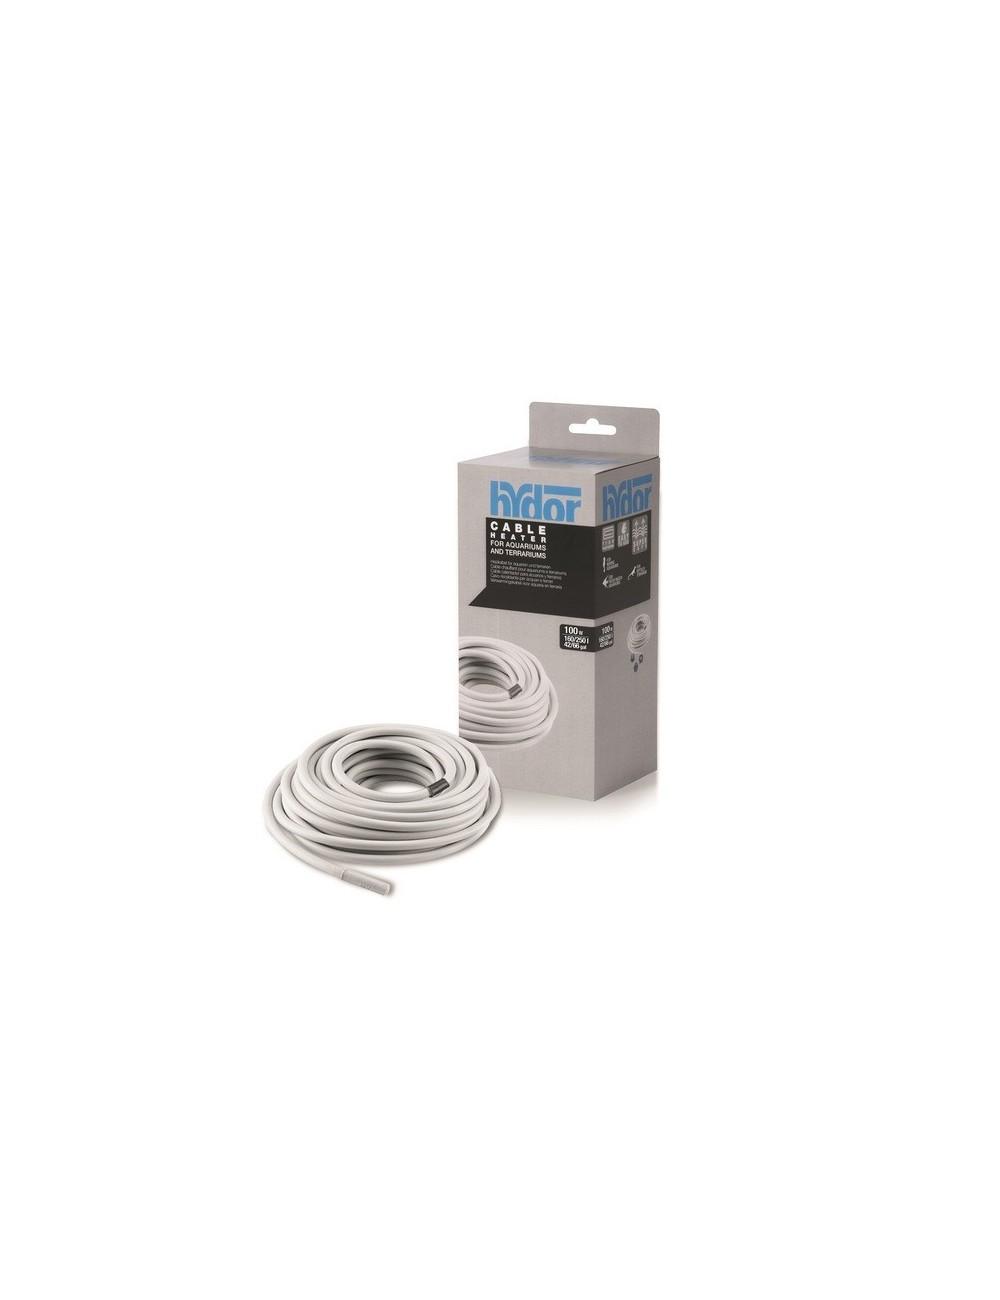 HYDOR - Hydro Kable - 100w - Câble chauffant pour aquarium